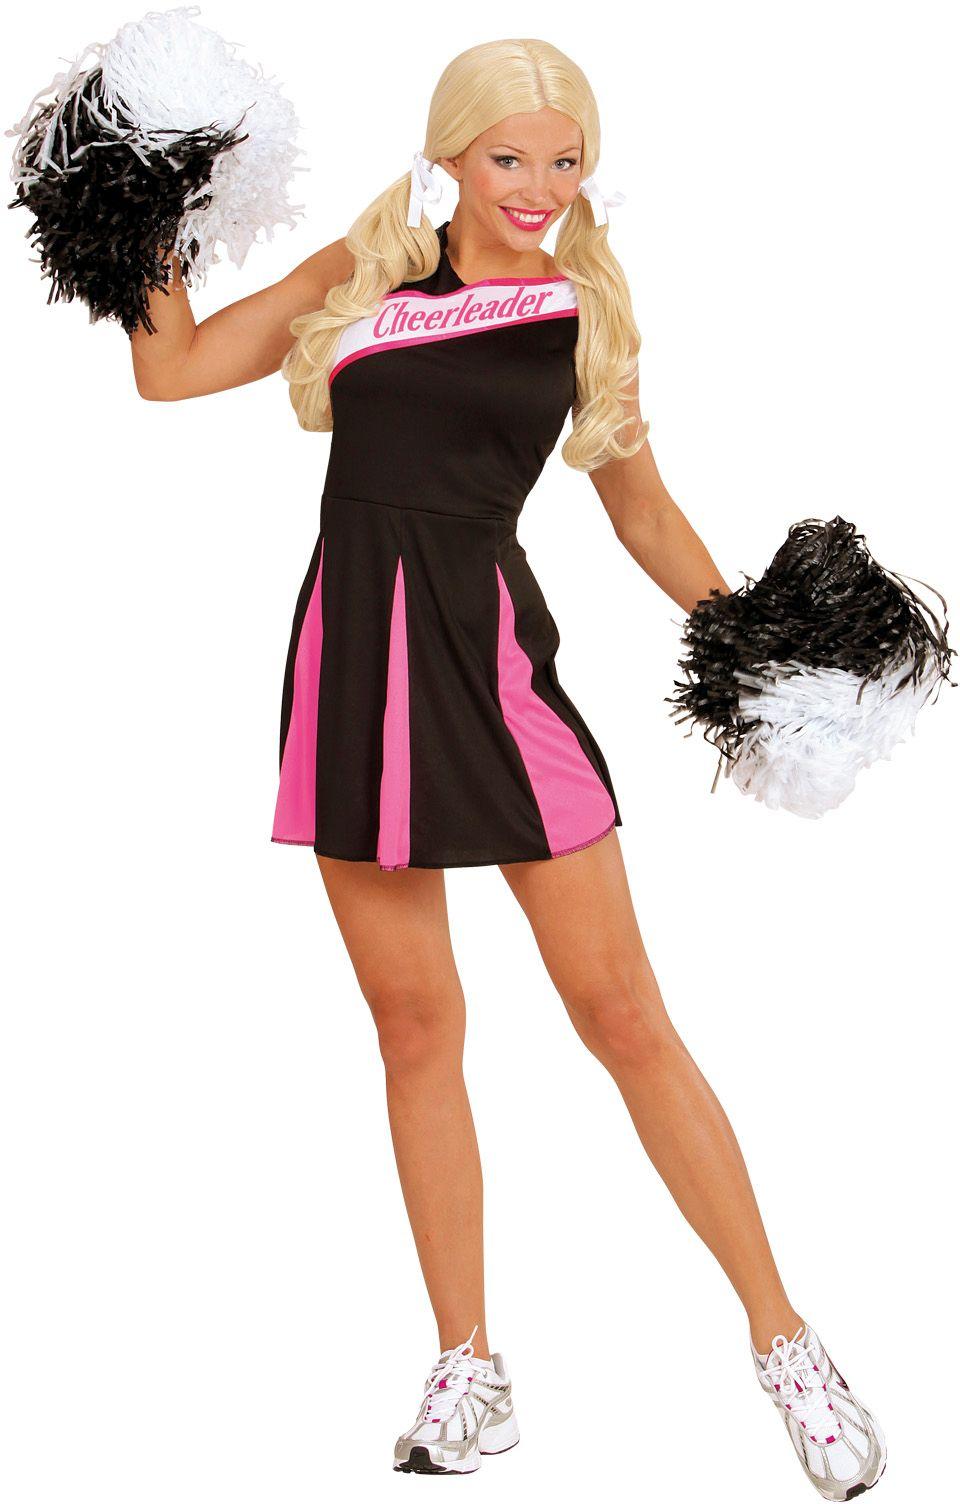 Cheerleader jurk